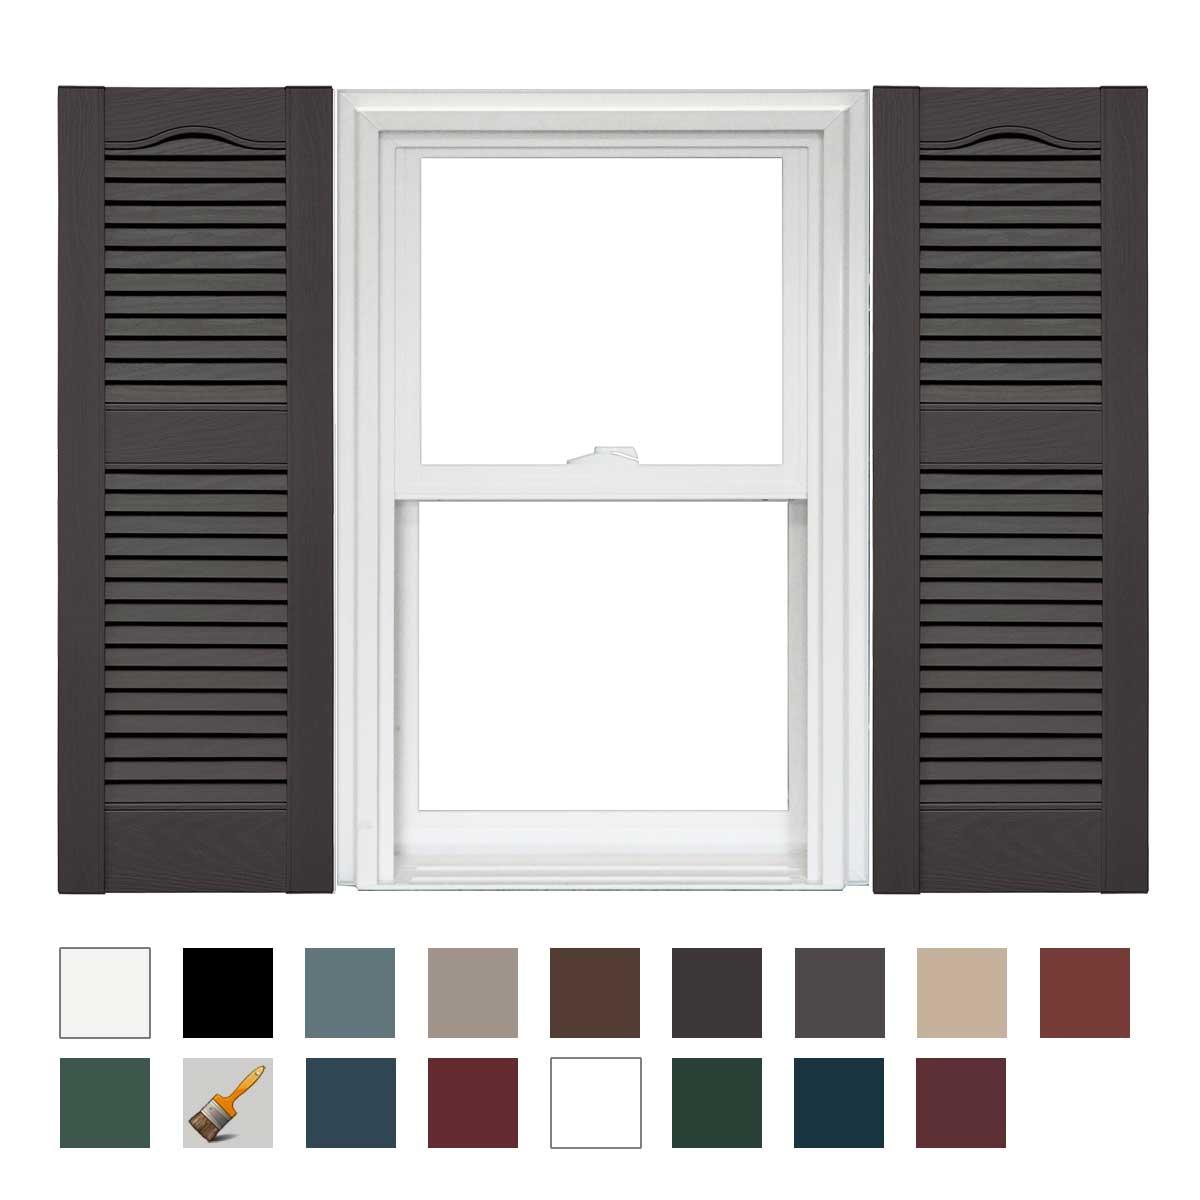 14.5 x 55 018 Tuxedo Gray